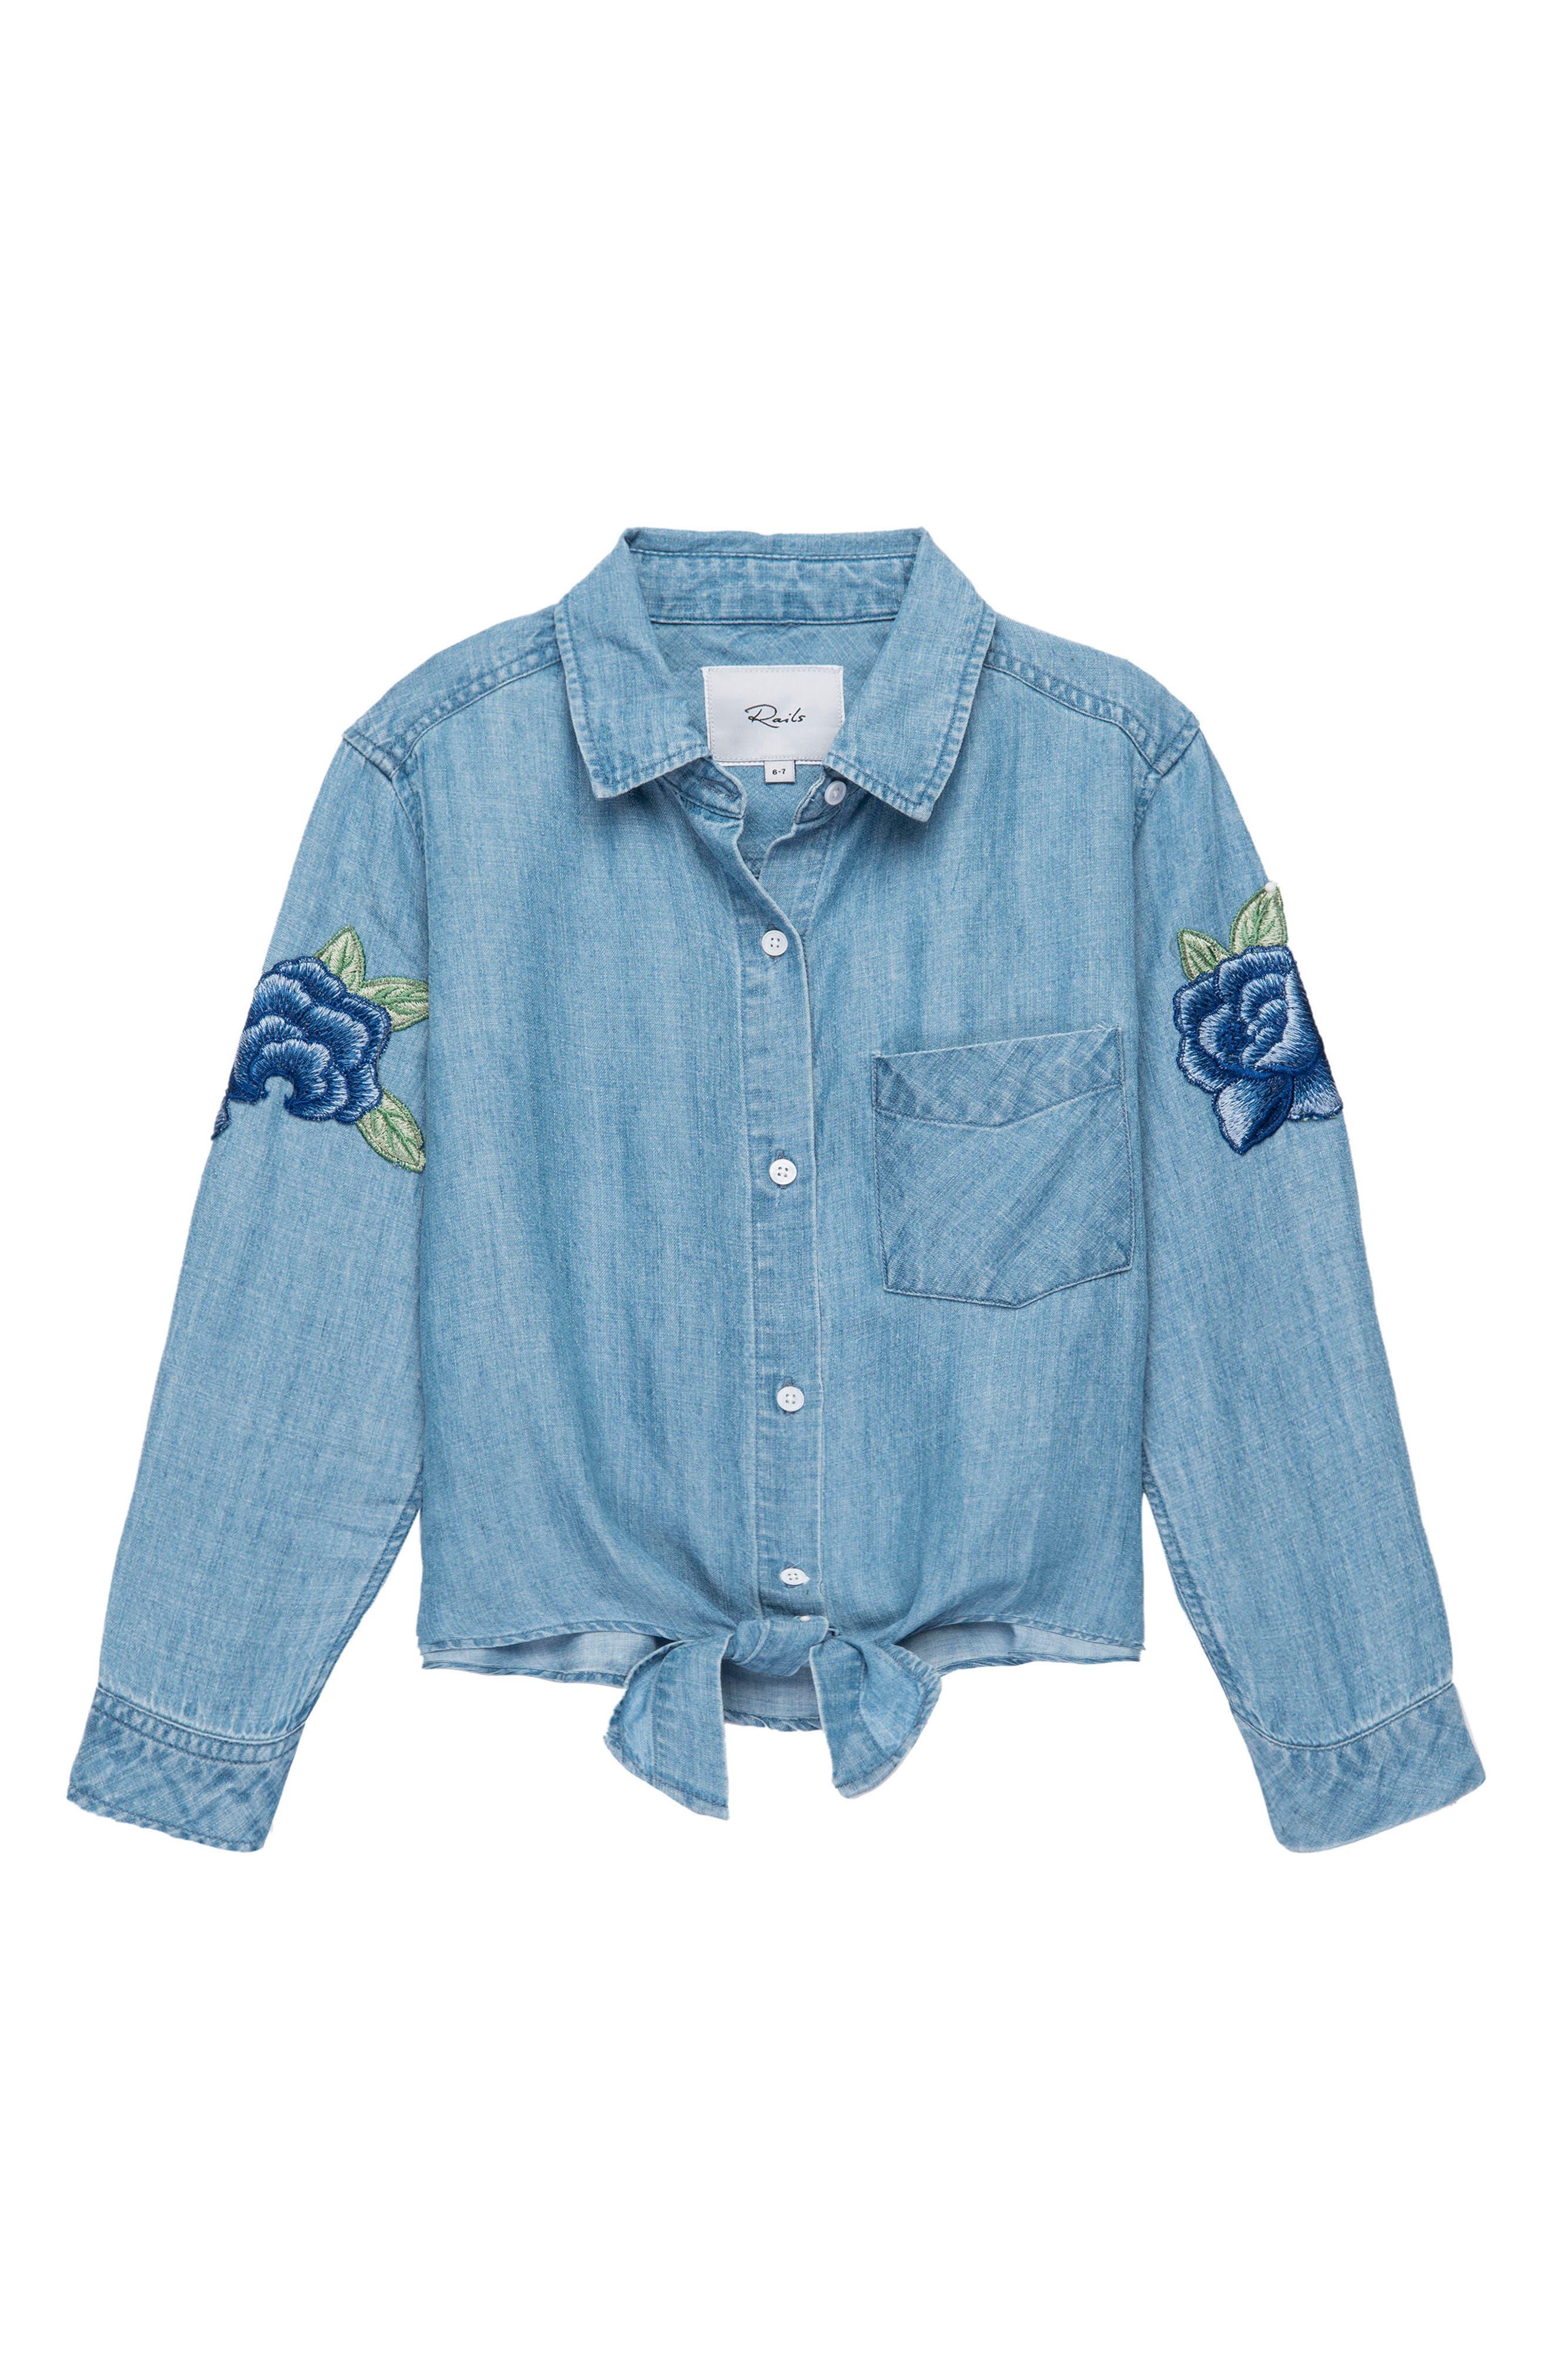 Main Image - Rails Valerie Flower Appliqué Shirt (Big Girls)